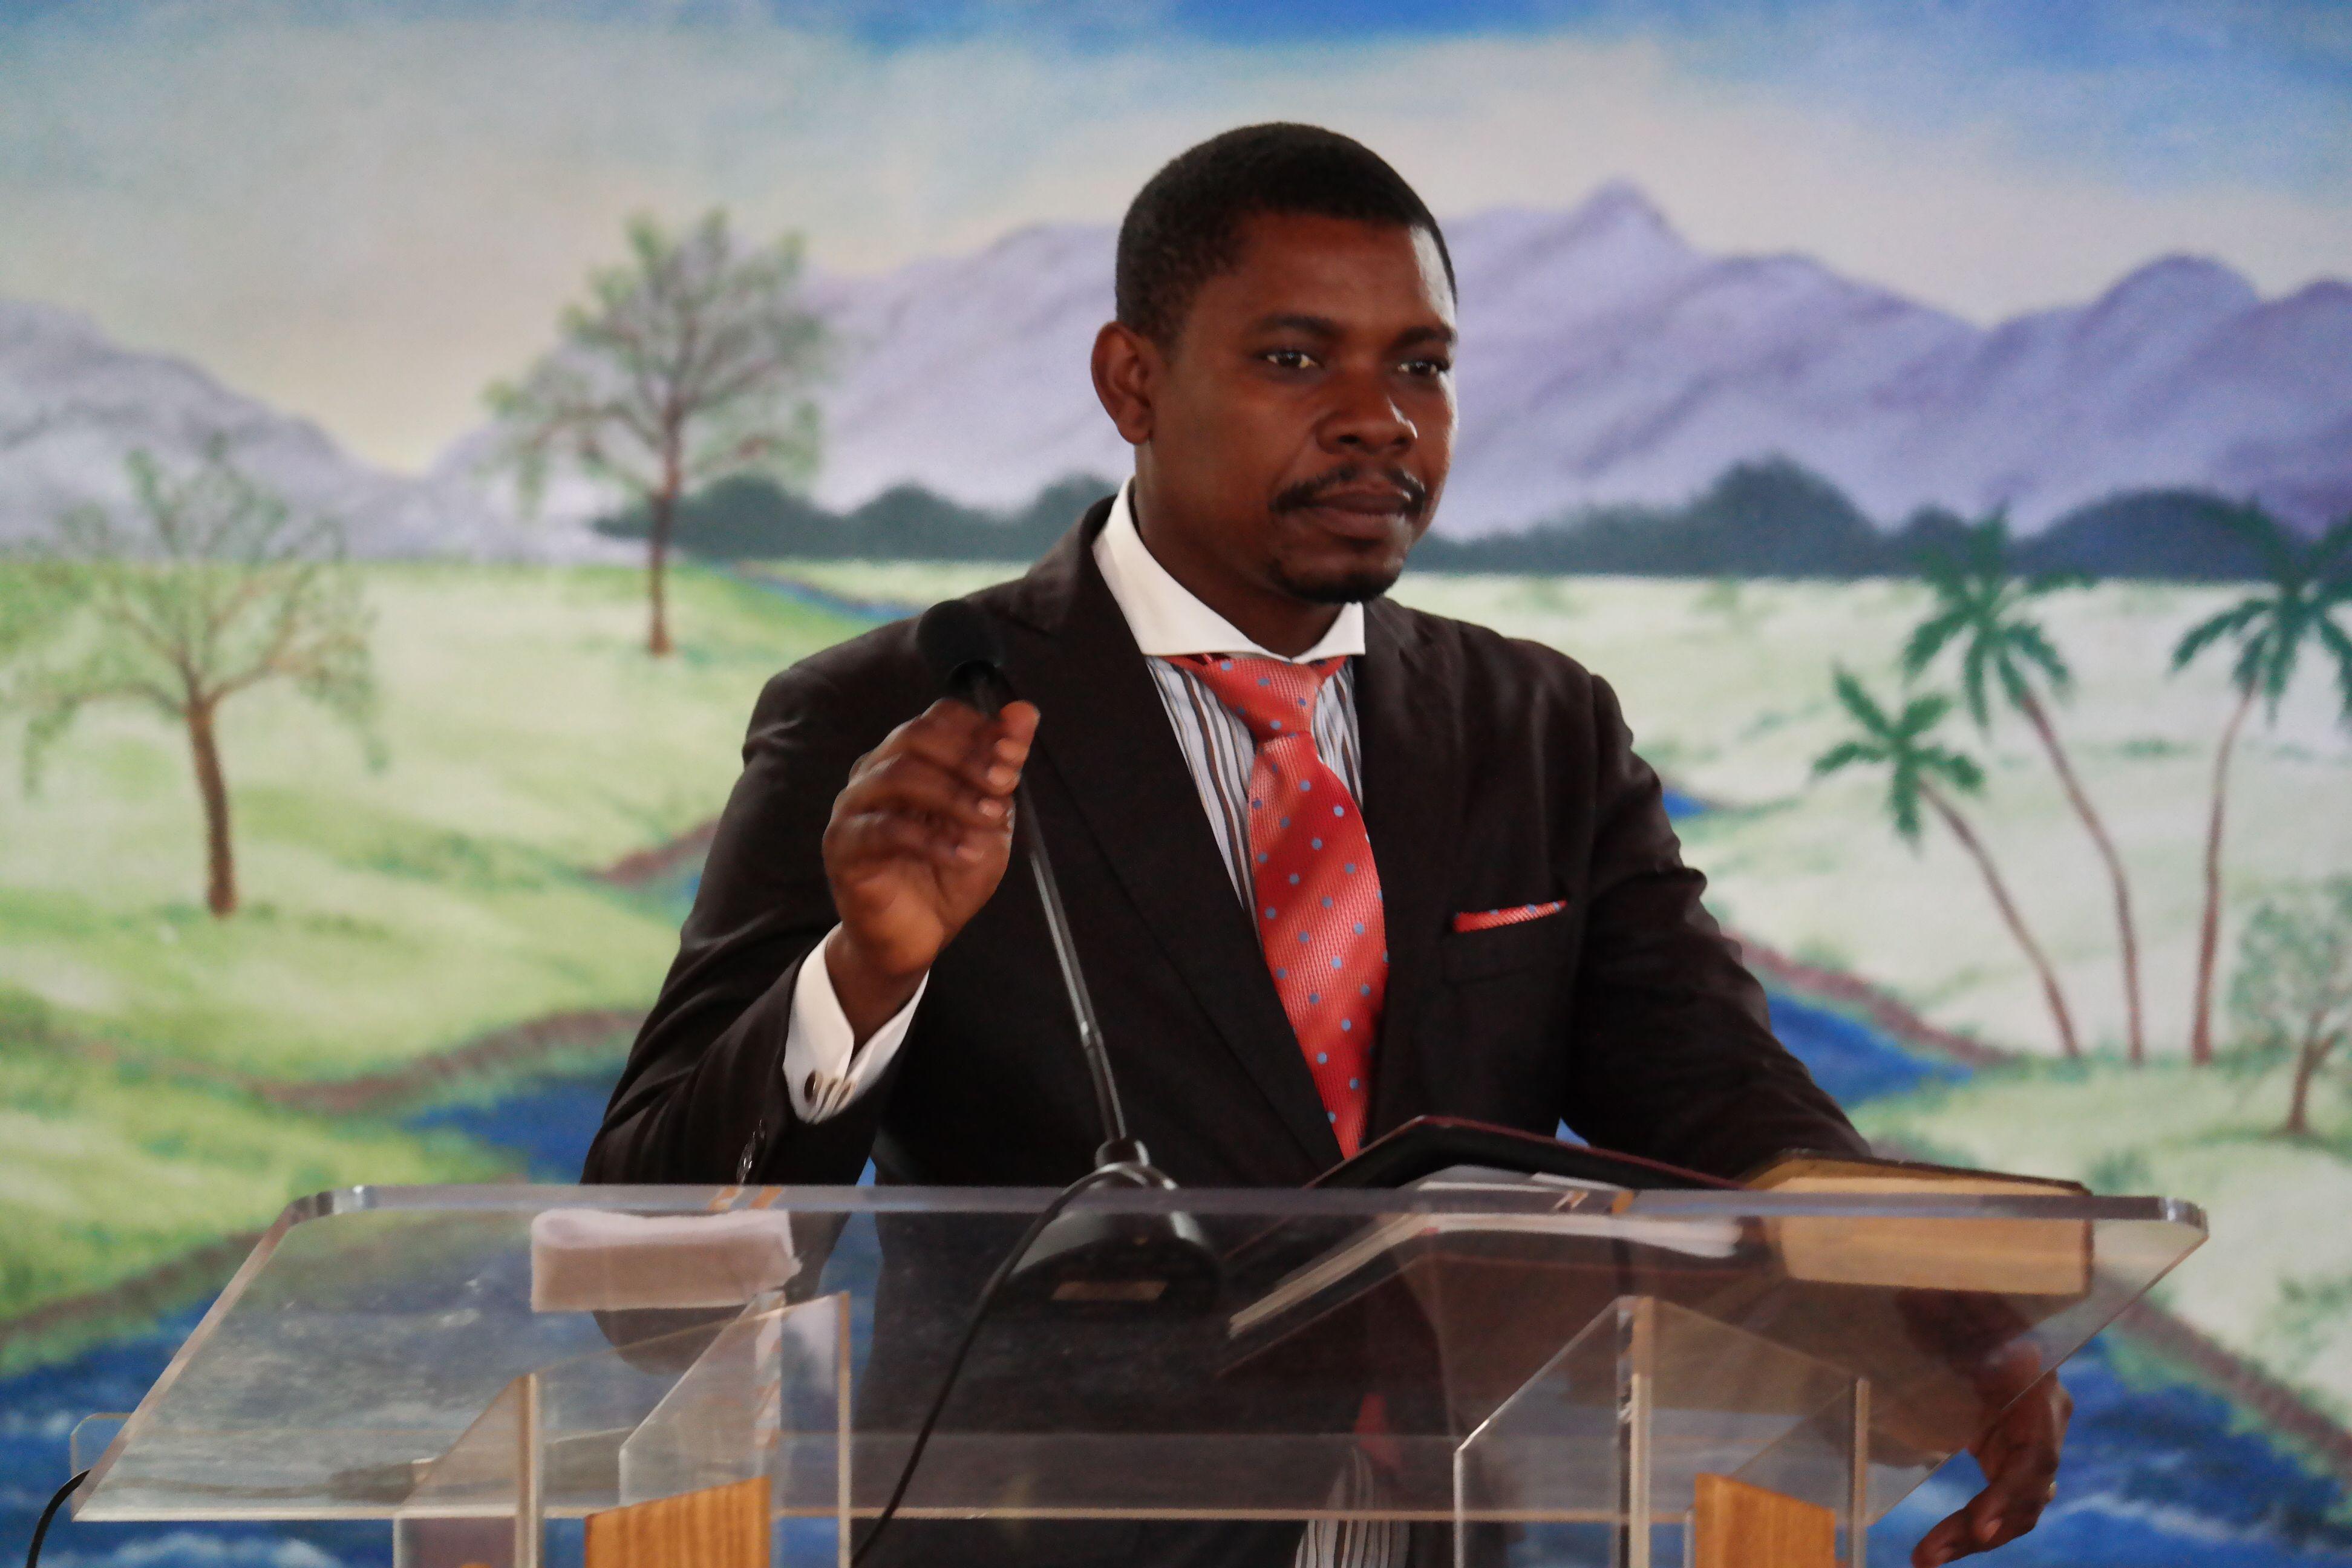 Youth Pastor Louis Wilnes